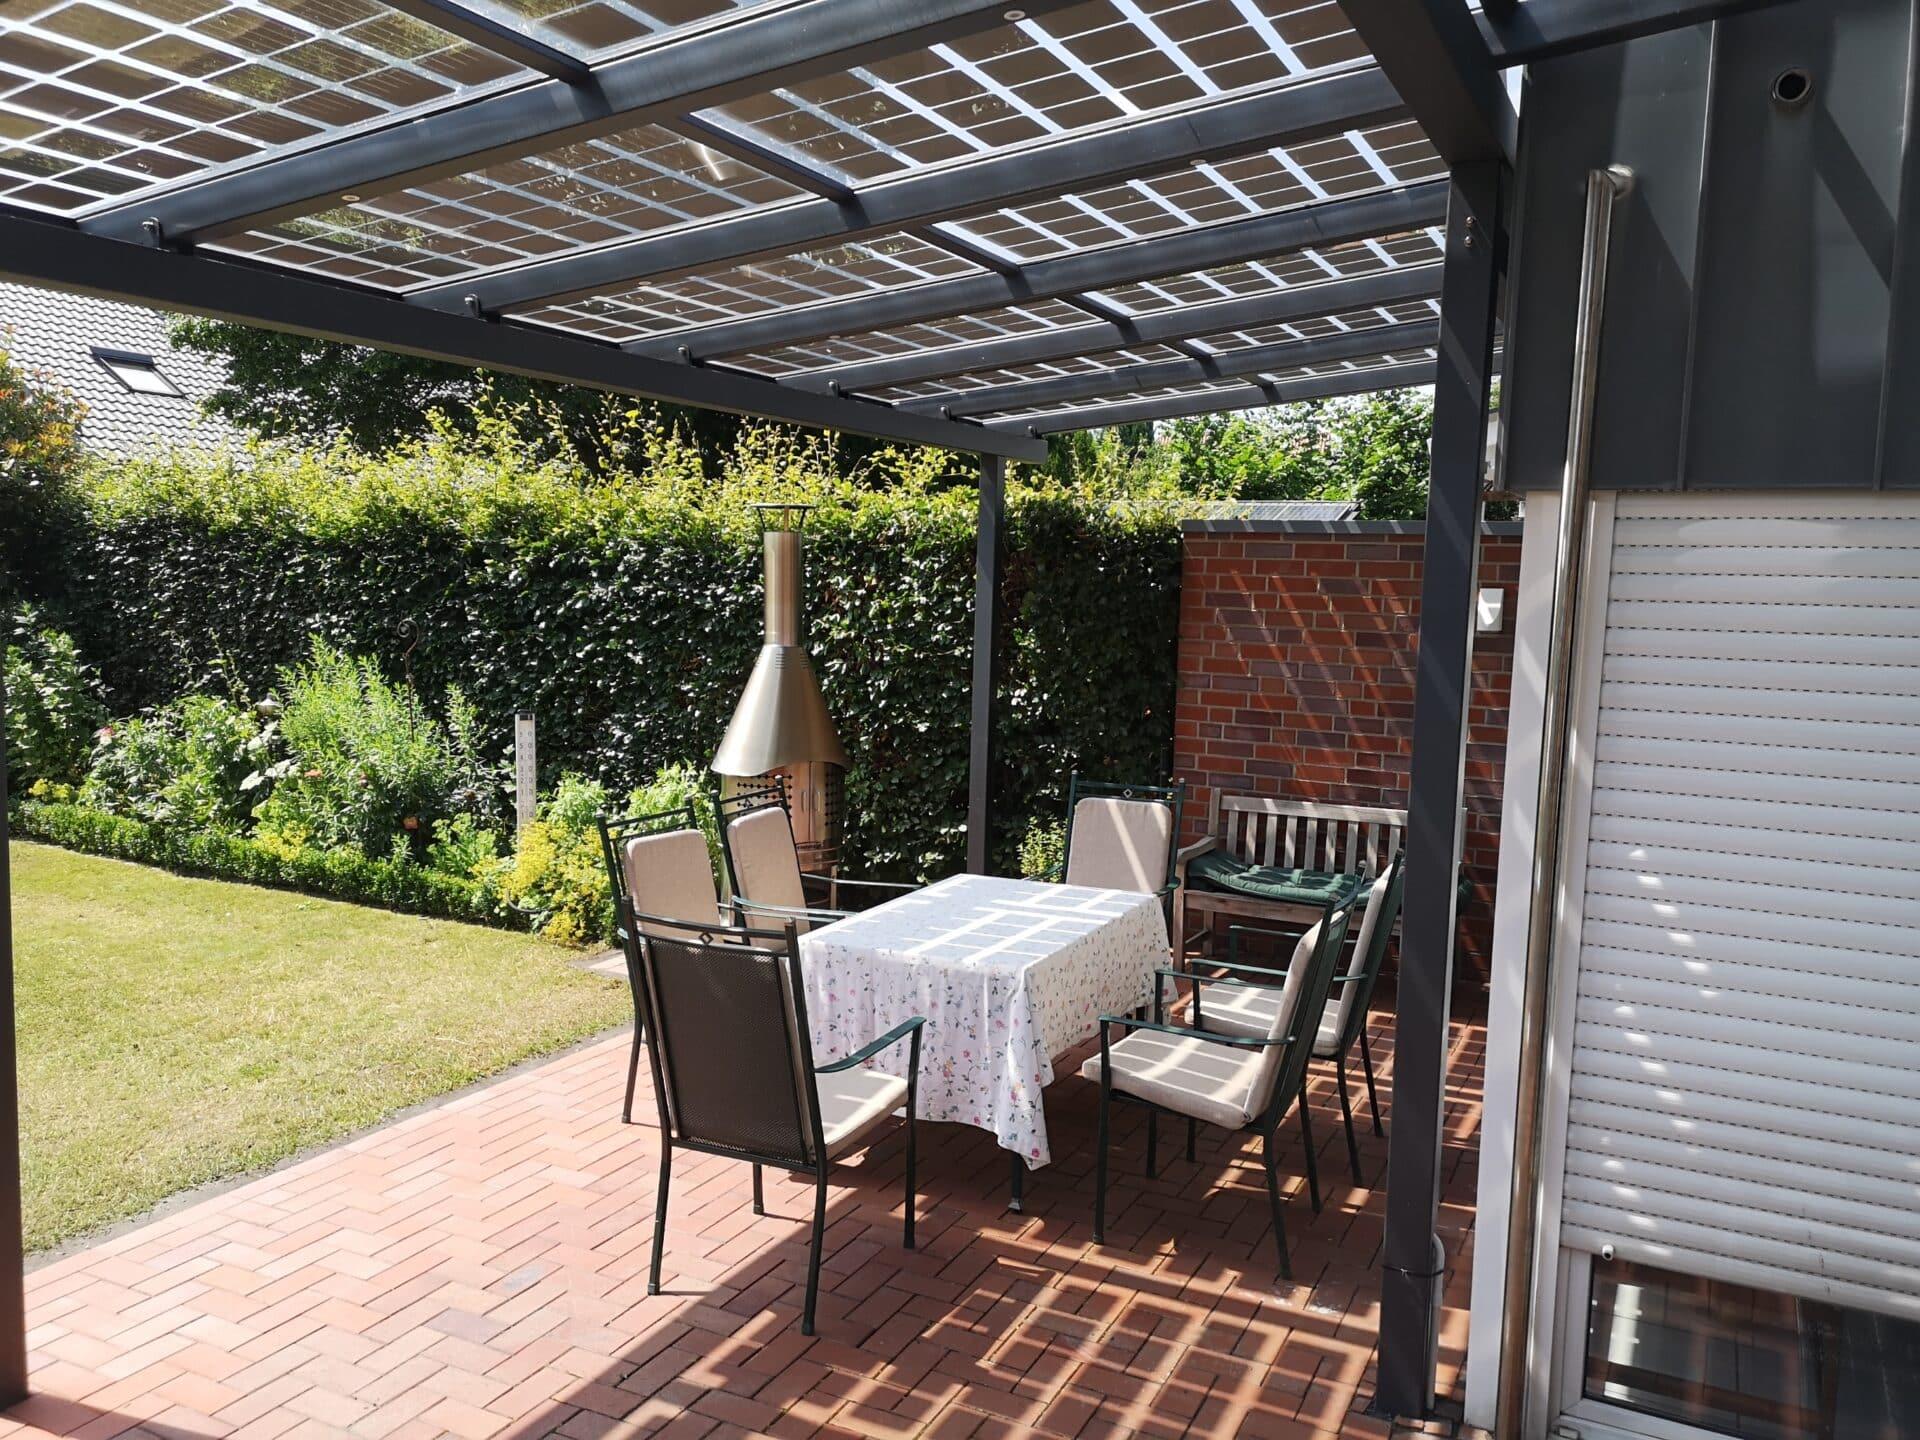 Solar Terrasseüberdachung